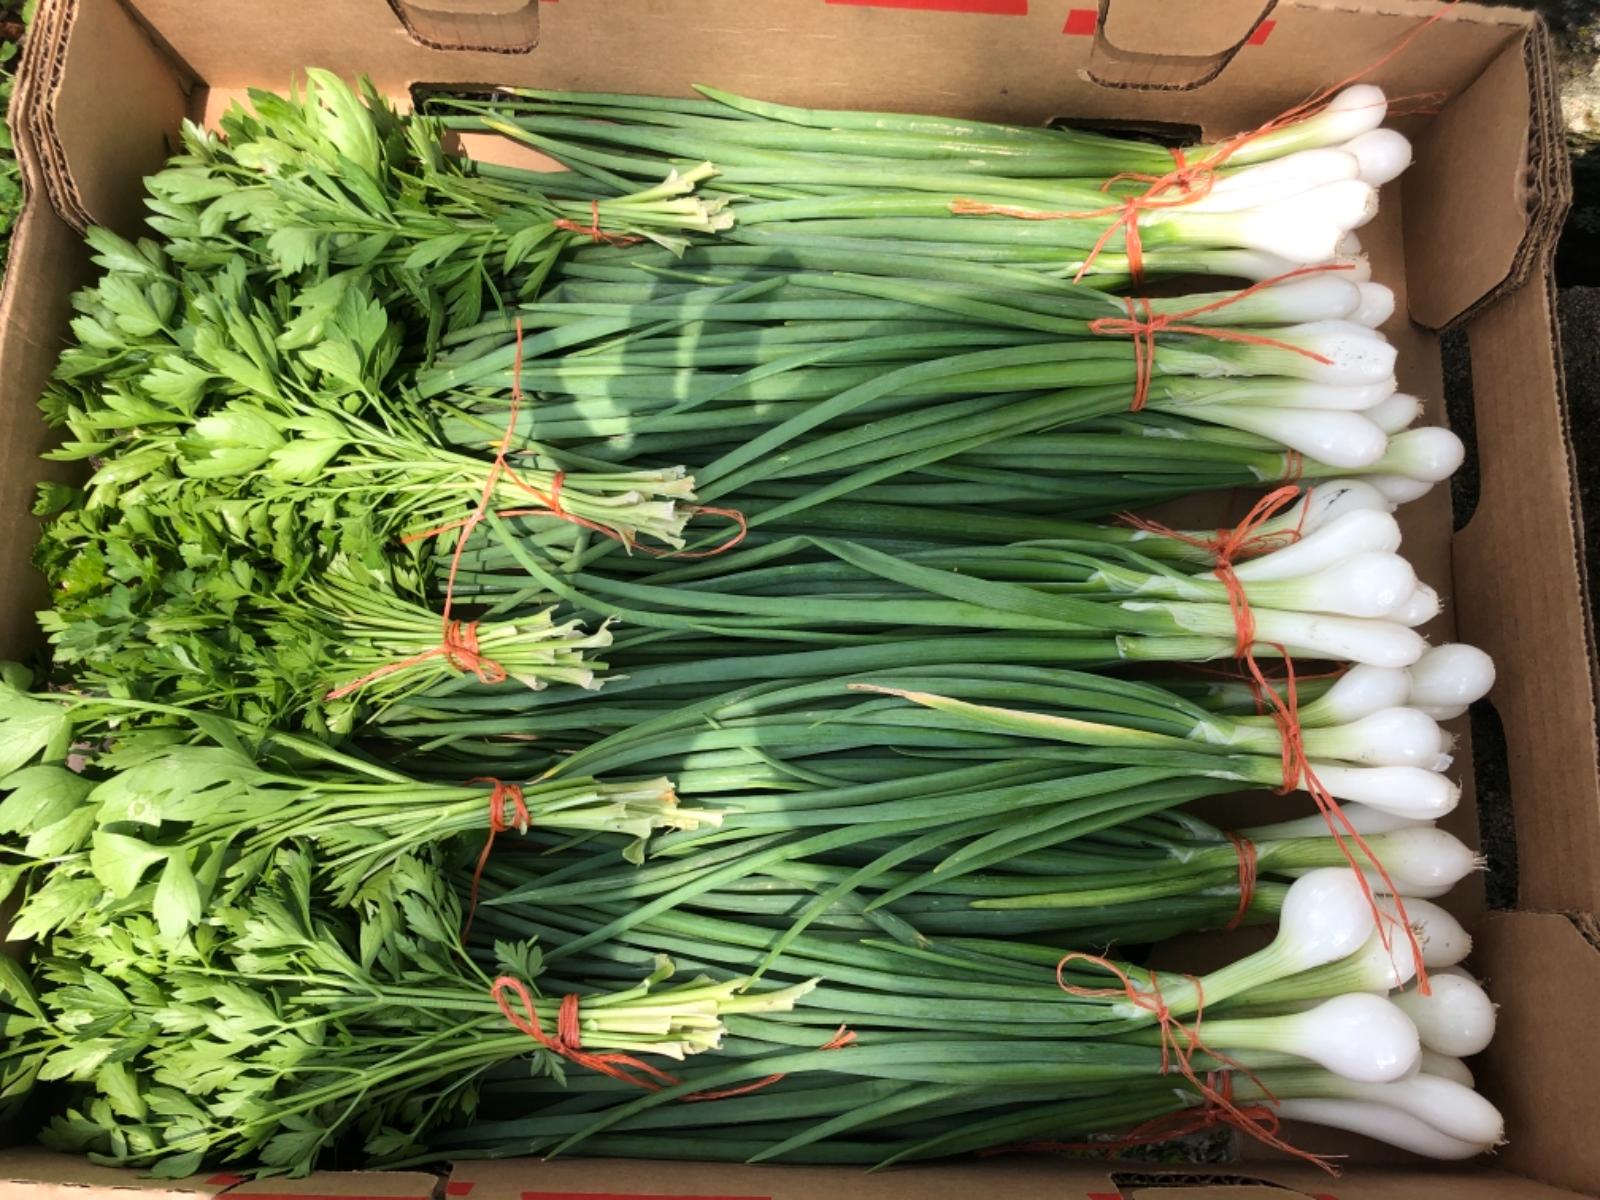 onions-scallions